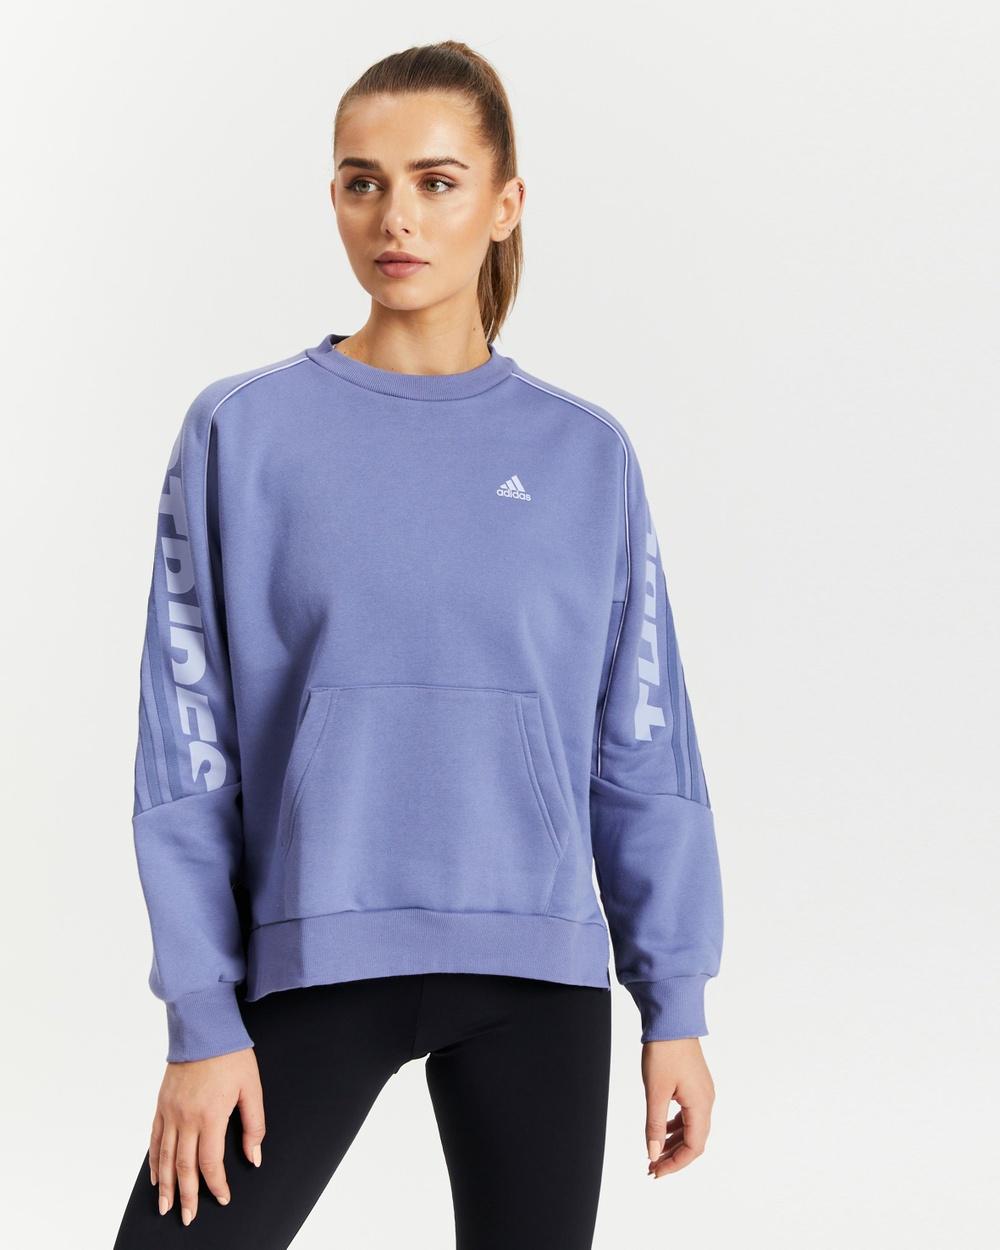 adidas Performance Sportswear Sweatshirt Crew Necks Orbit Violet